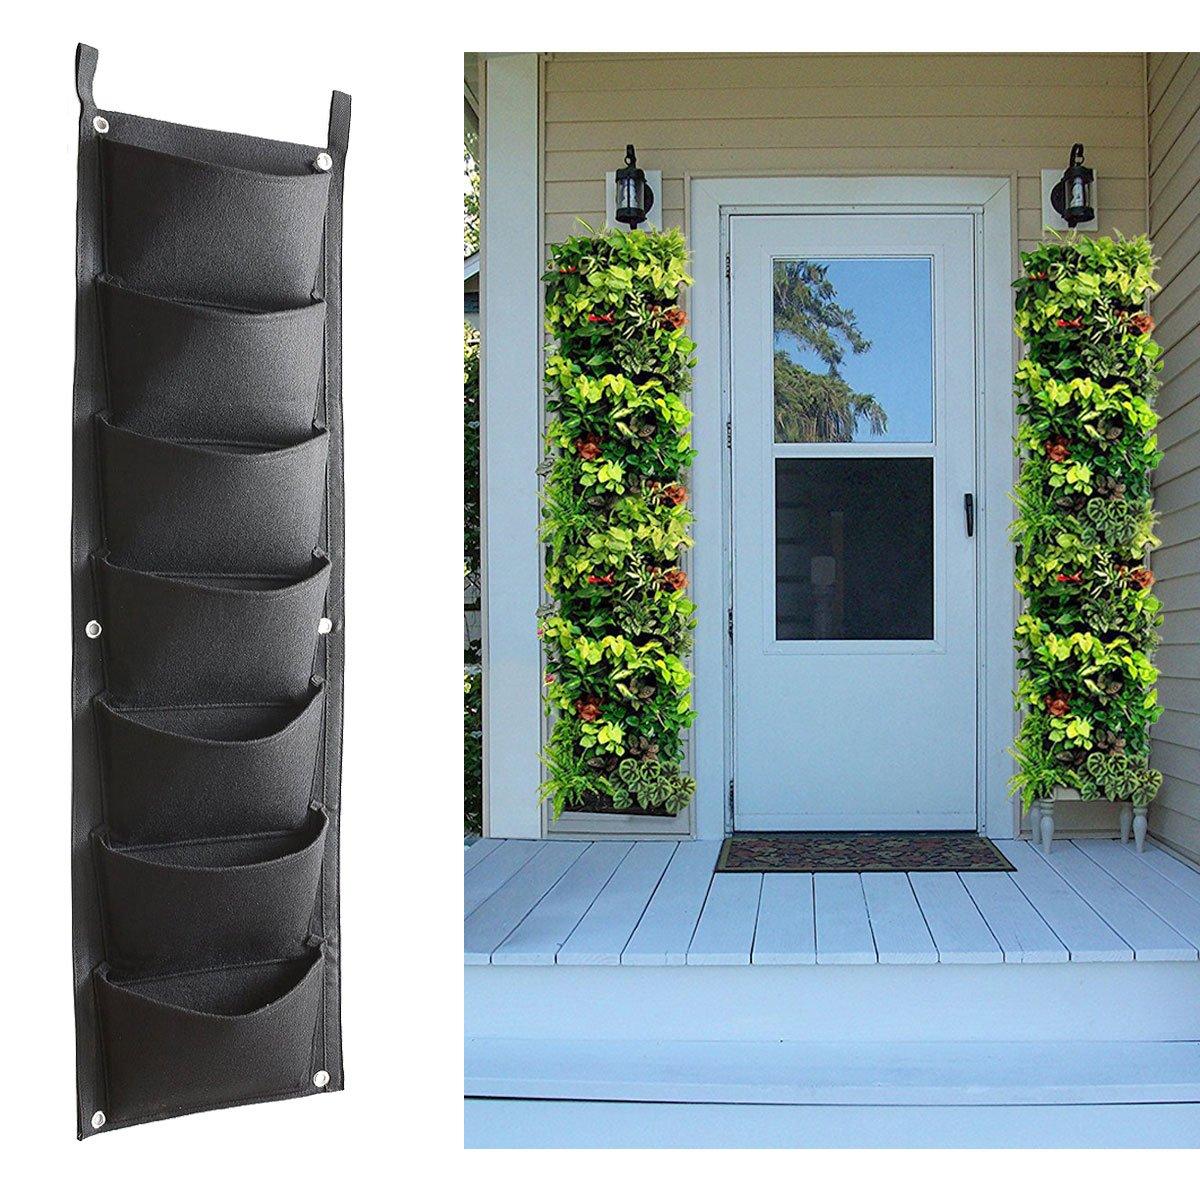 Amazon.com: Vertical Garden Hanging Planter, 7 Pockets, Wall Hanging ...